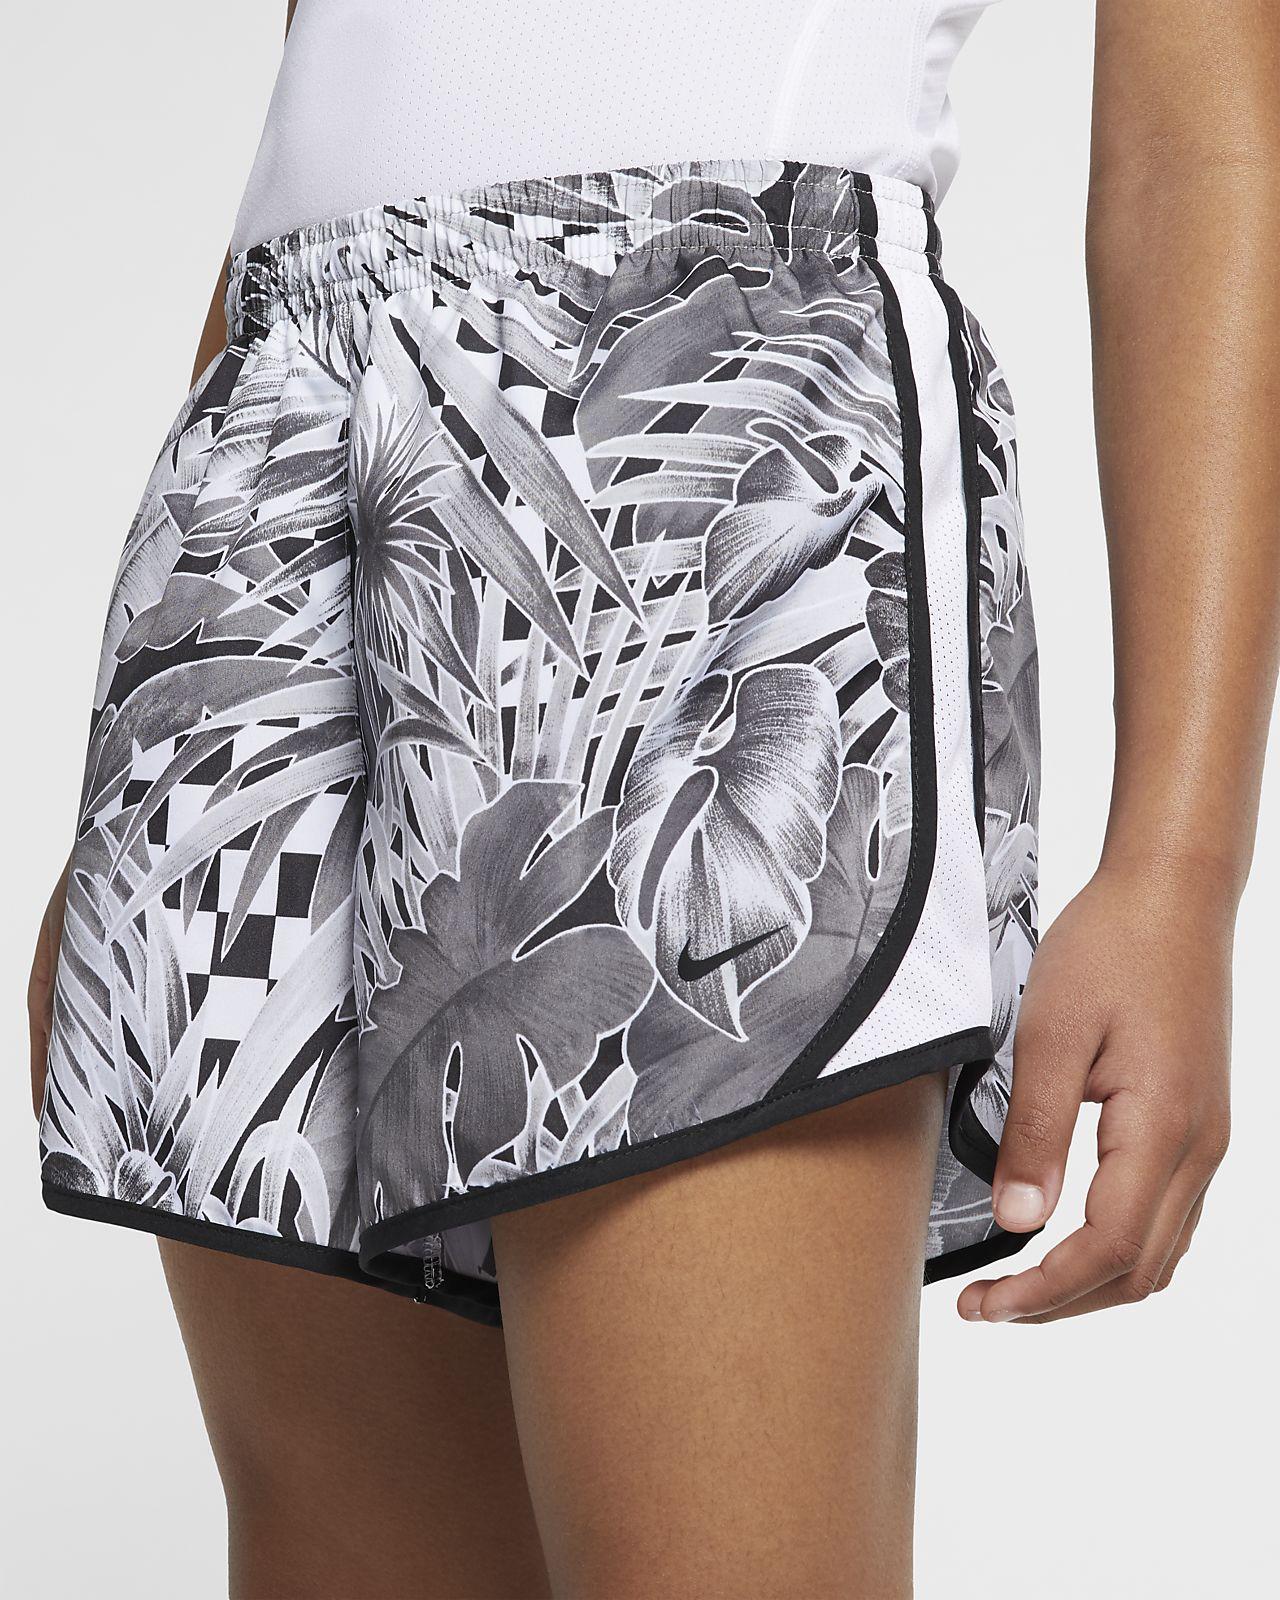 5821090cacd1 Nike Dri-FIT Tempo Big Kids' (Girls') Printed Running Shorts. Nike.com